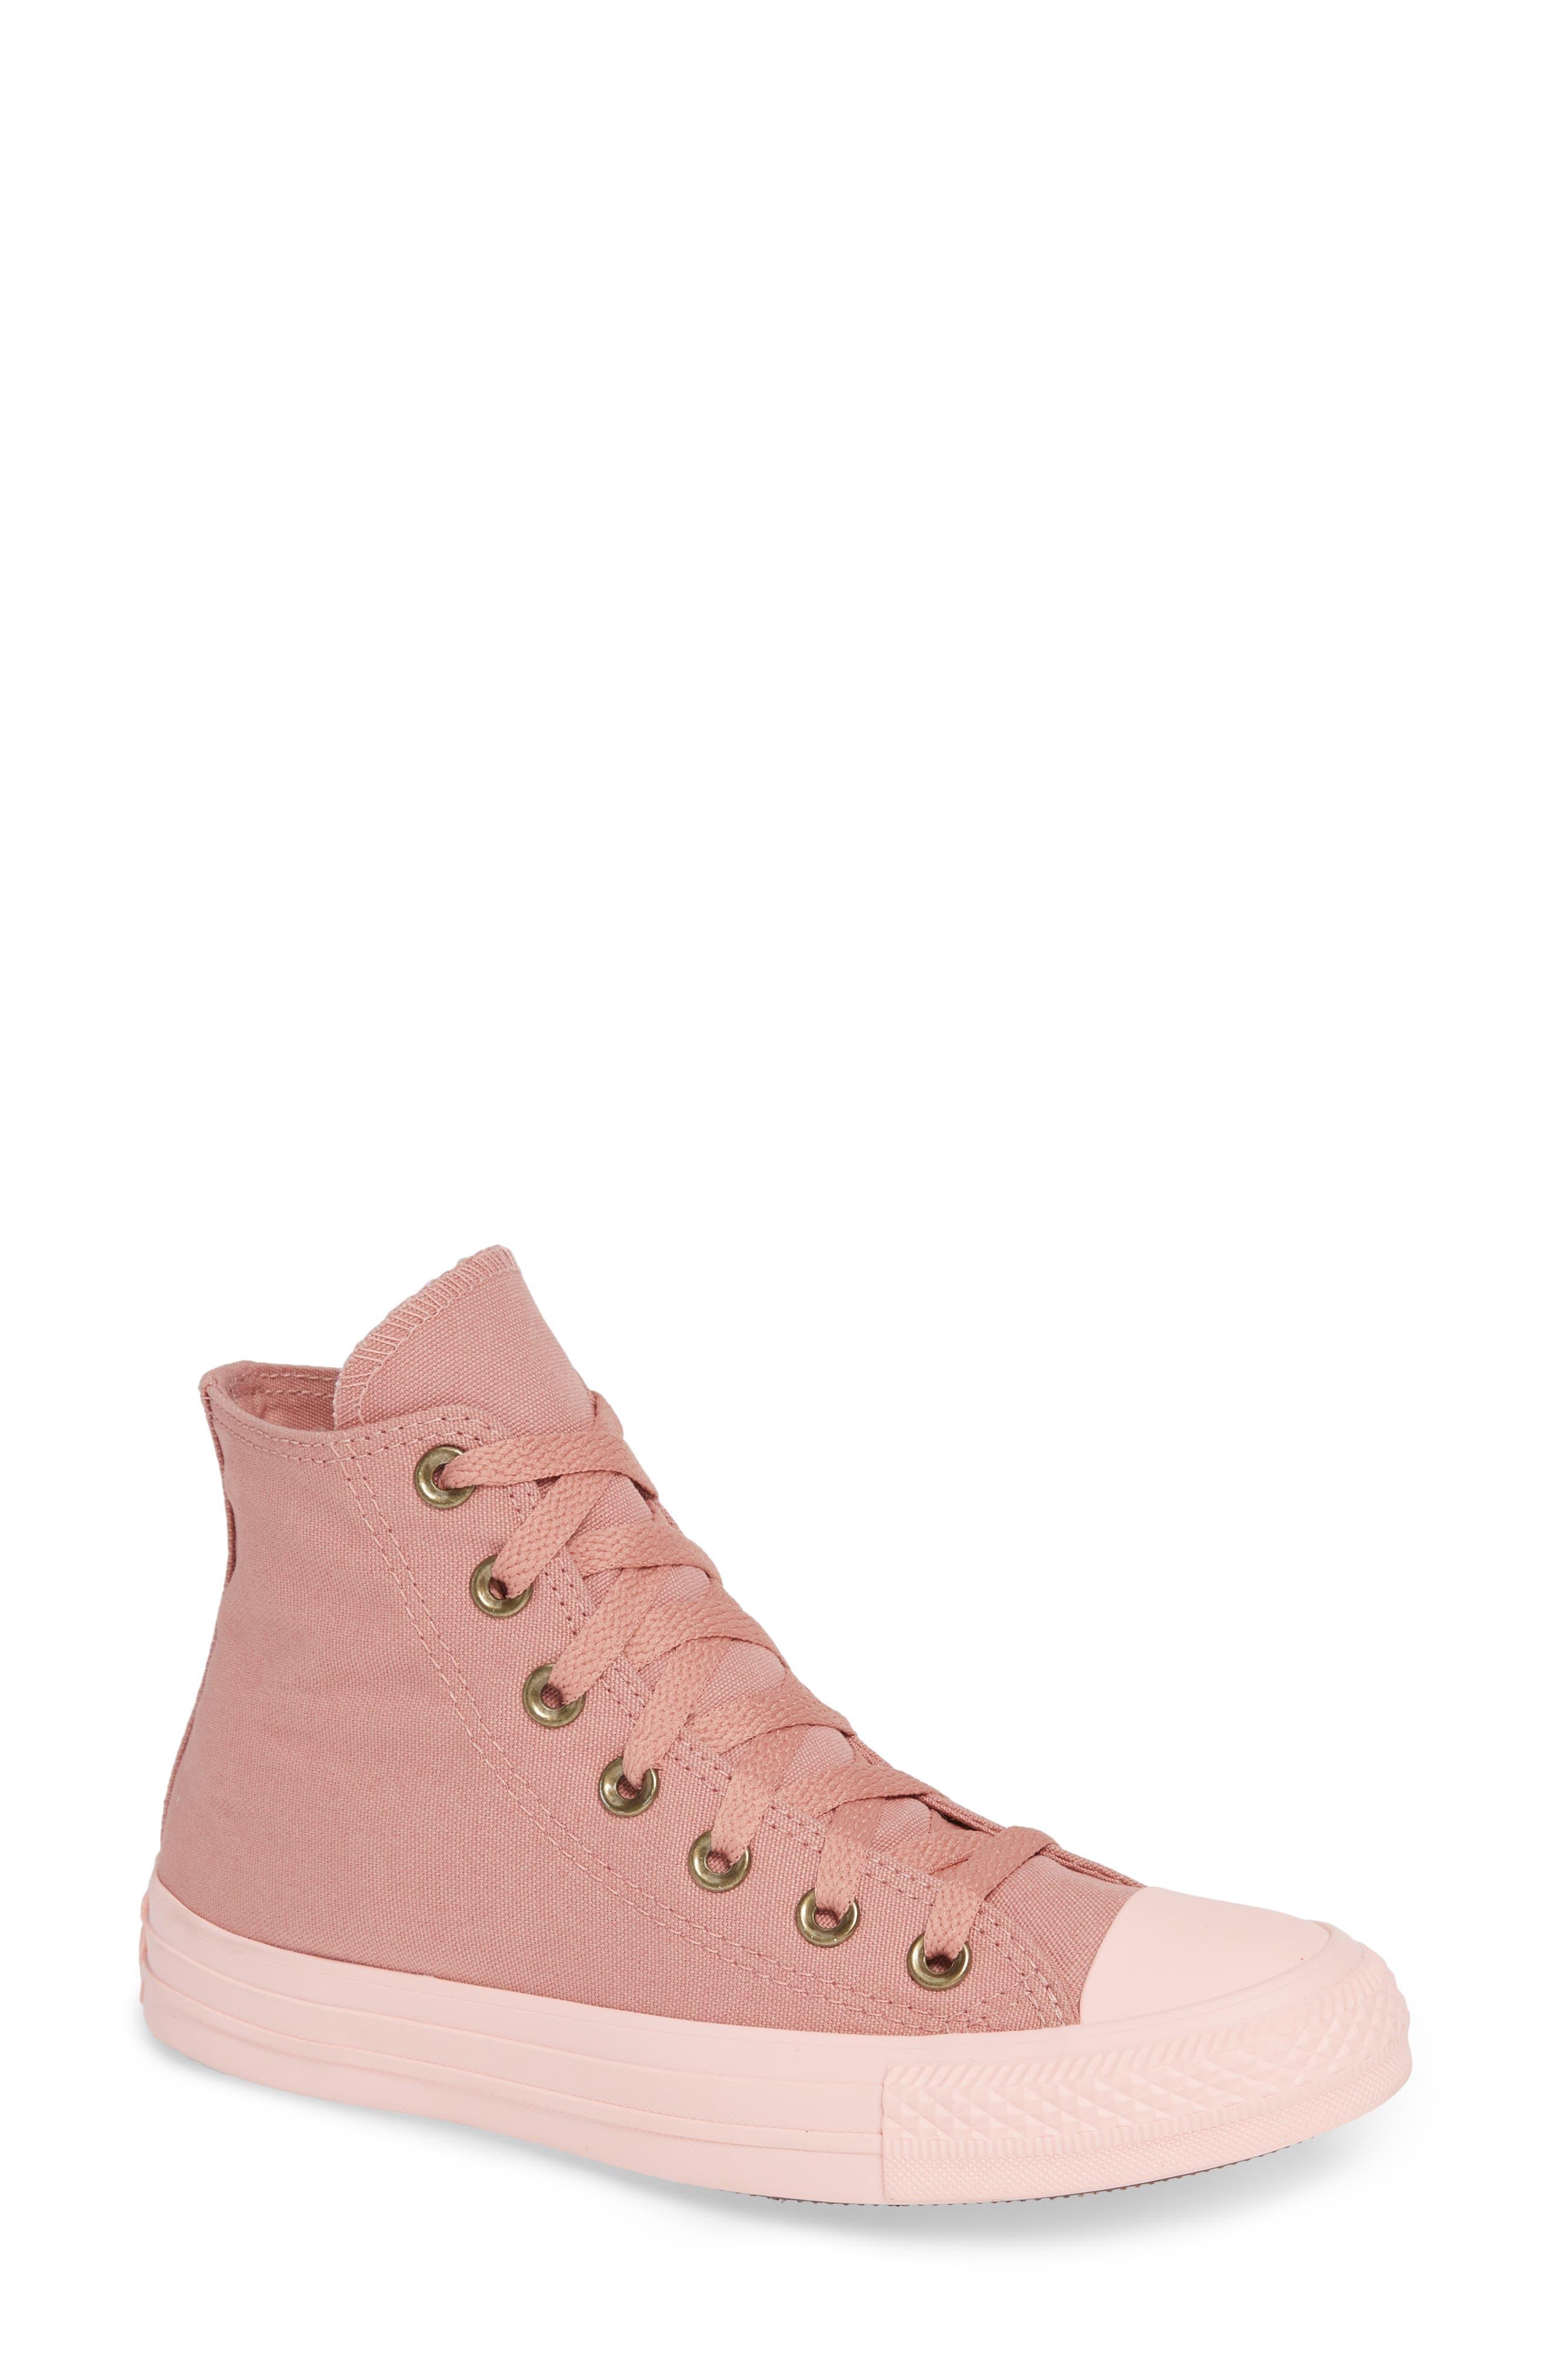 Chuck Taylor<sup>®</sup> All Star<sup>®</sup> Botanical High Top Sneaker,                             Main thumbnail 1, color,                             RUST PINK